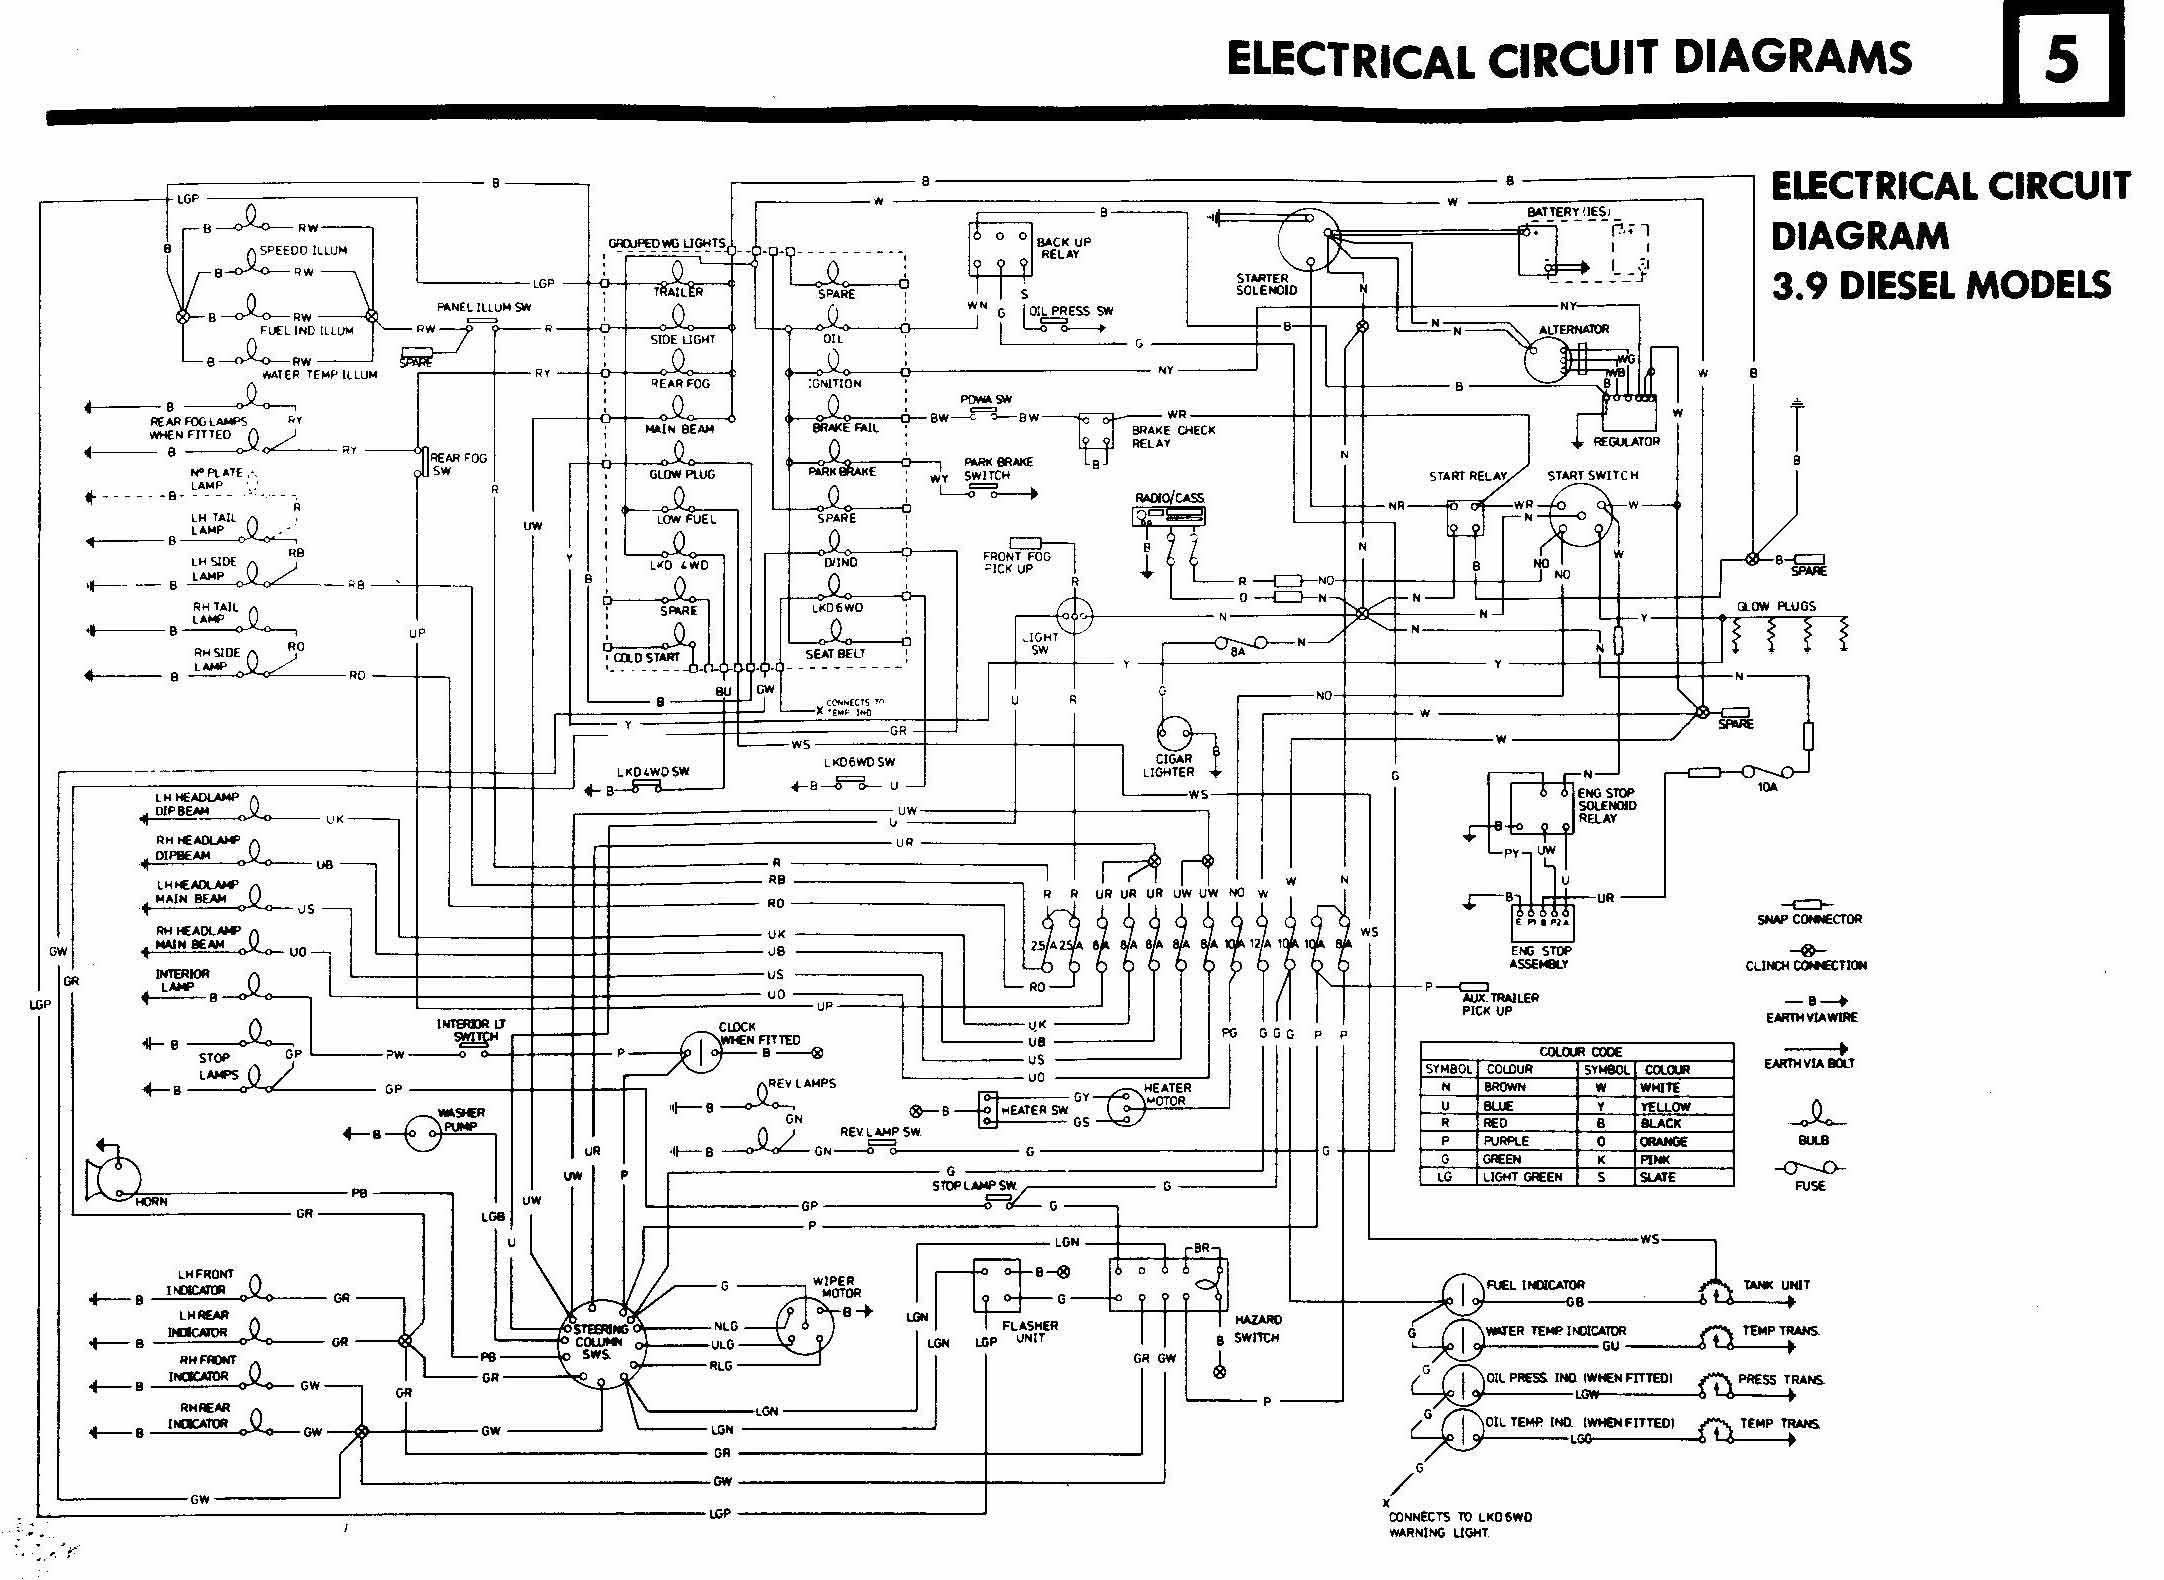 WRG-3813] Bmw E46 Harman Kardon Wiring Diagram on mini cooper lighter fuse, mini cooper drivetrain diagram, mini cooper start switch, mini cooper underneath diagram, mini parts diagram, mini cooper fuses diagram, mini cooper tractor, mini cooper exhaust system diagram, mini cooper circuit, mini cooper roof diagram, mini cooper hid retrofit, mini puddle lights, mini cooper transmission diagram, mini cooper crankshaft, mini cooper wiring harness, mini cooper amp location, mini cooper flywheel, mini cooper coolant diagram, mini cooper schematics, mini cooper ac diagram,